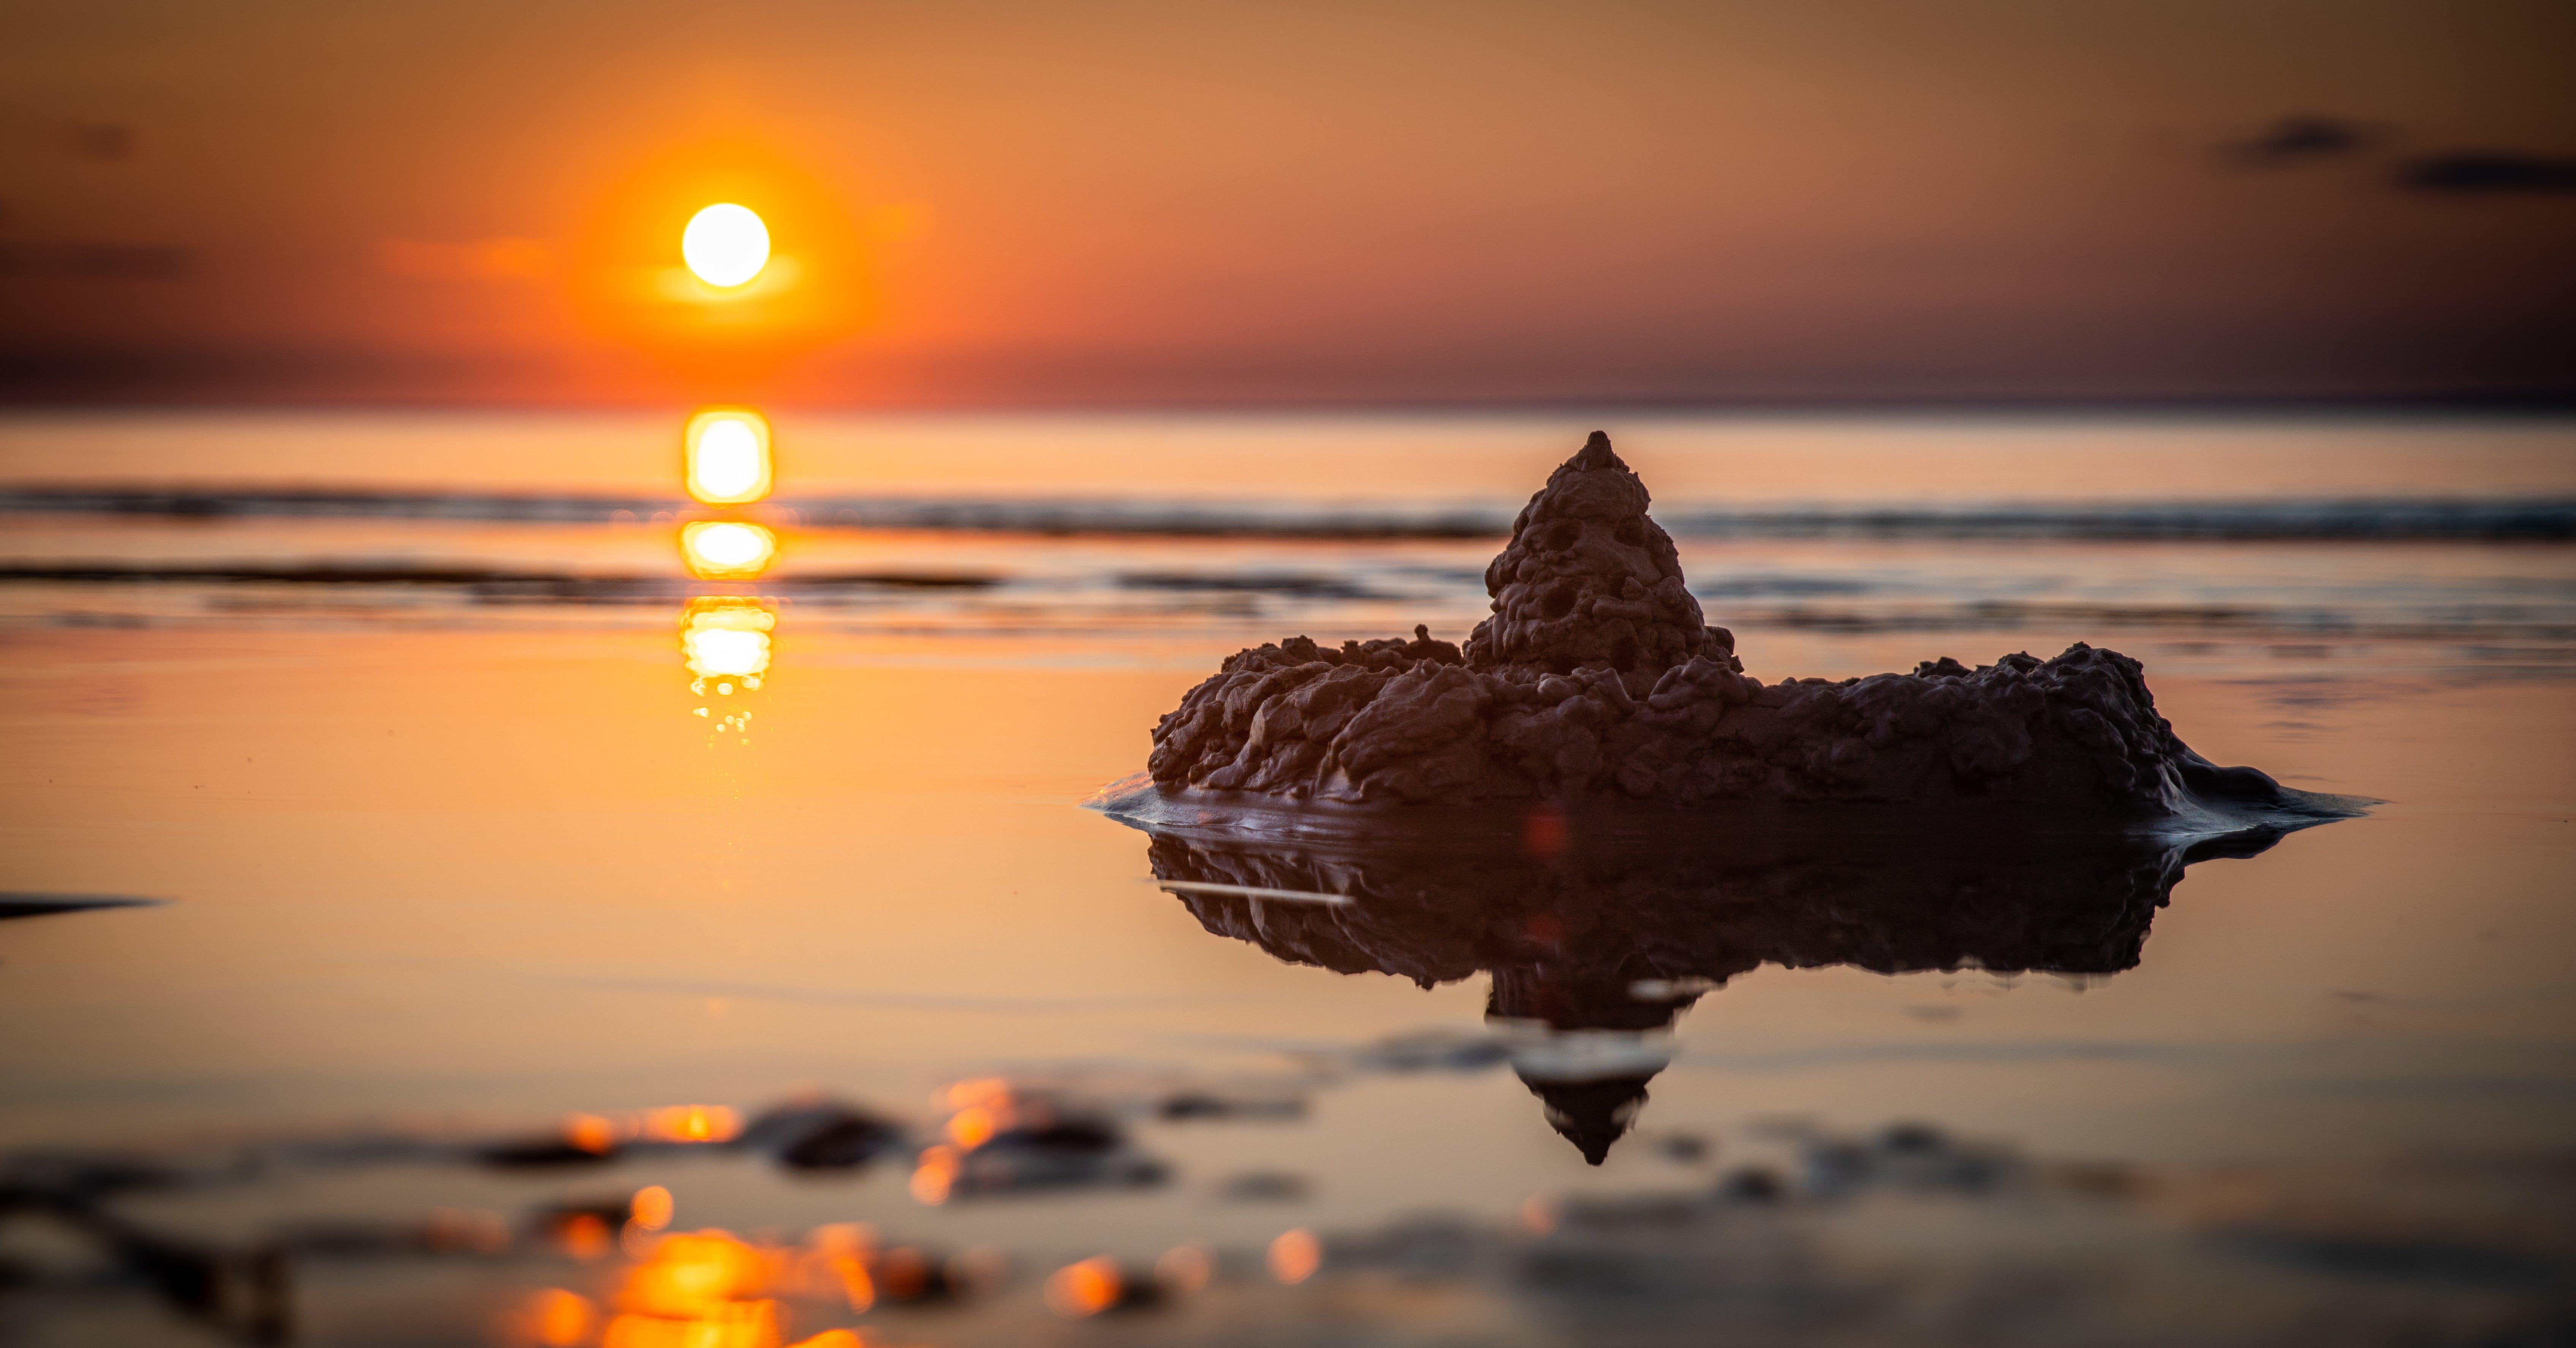 Sand Castle on Seashore during Golden Hour